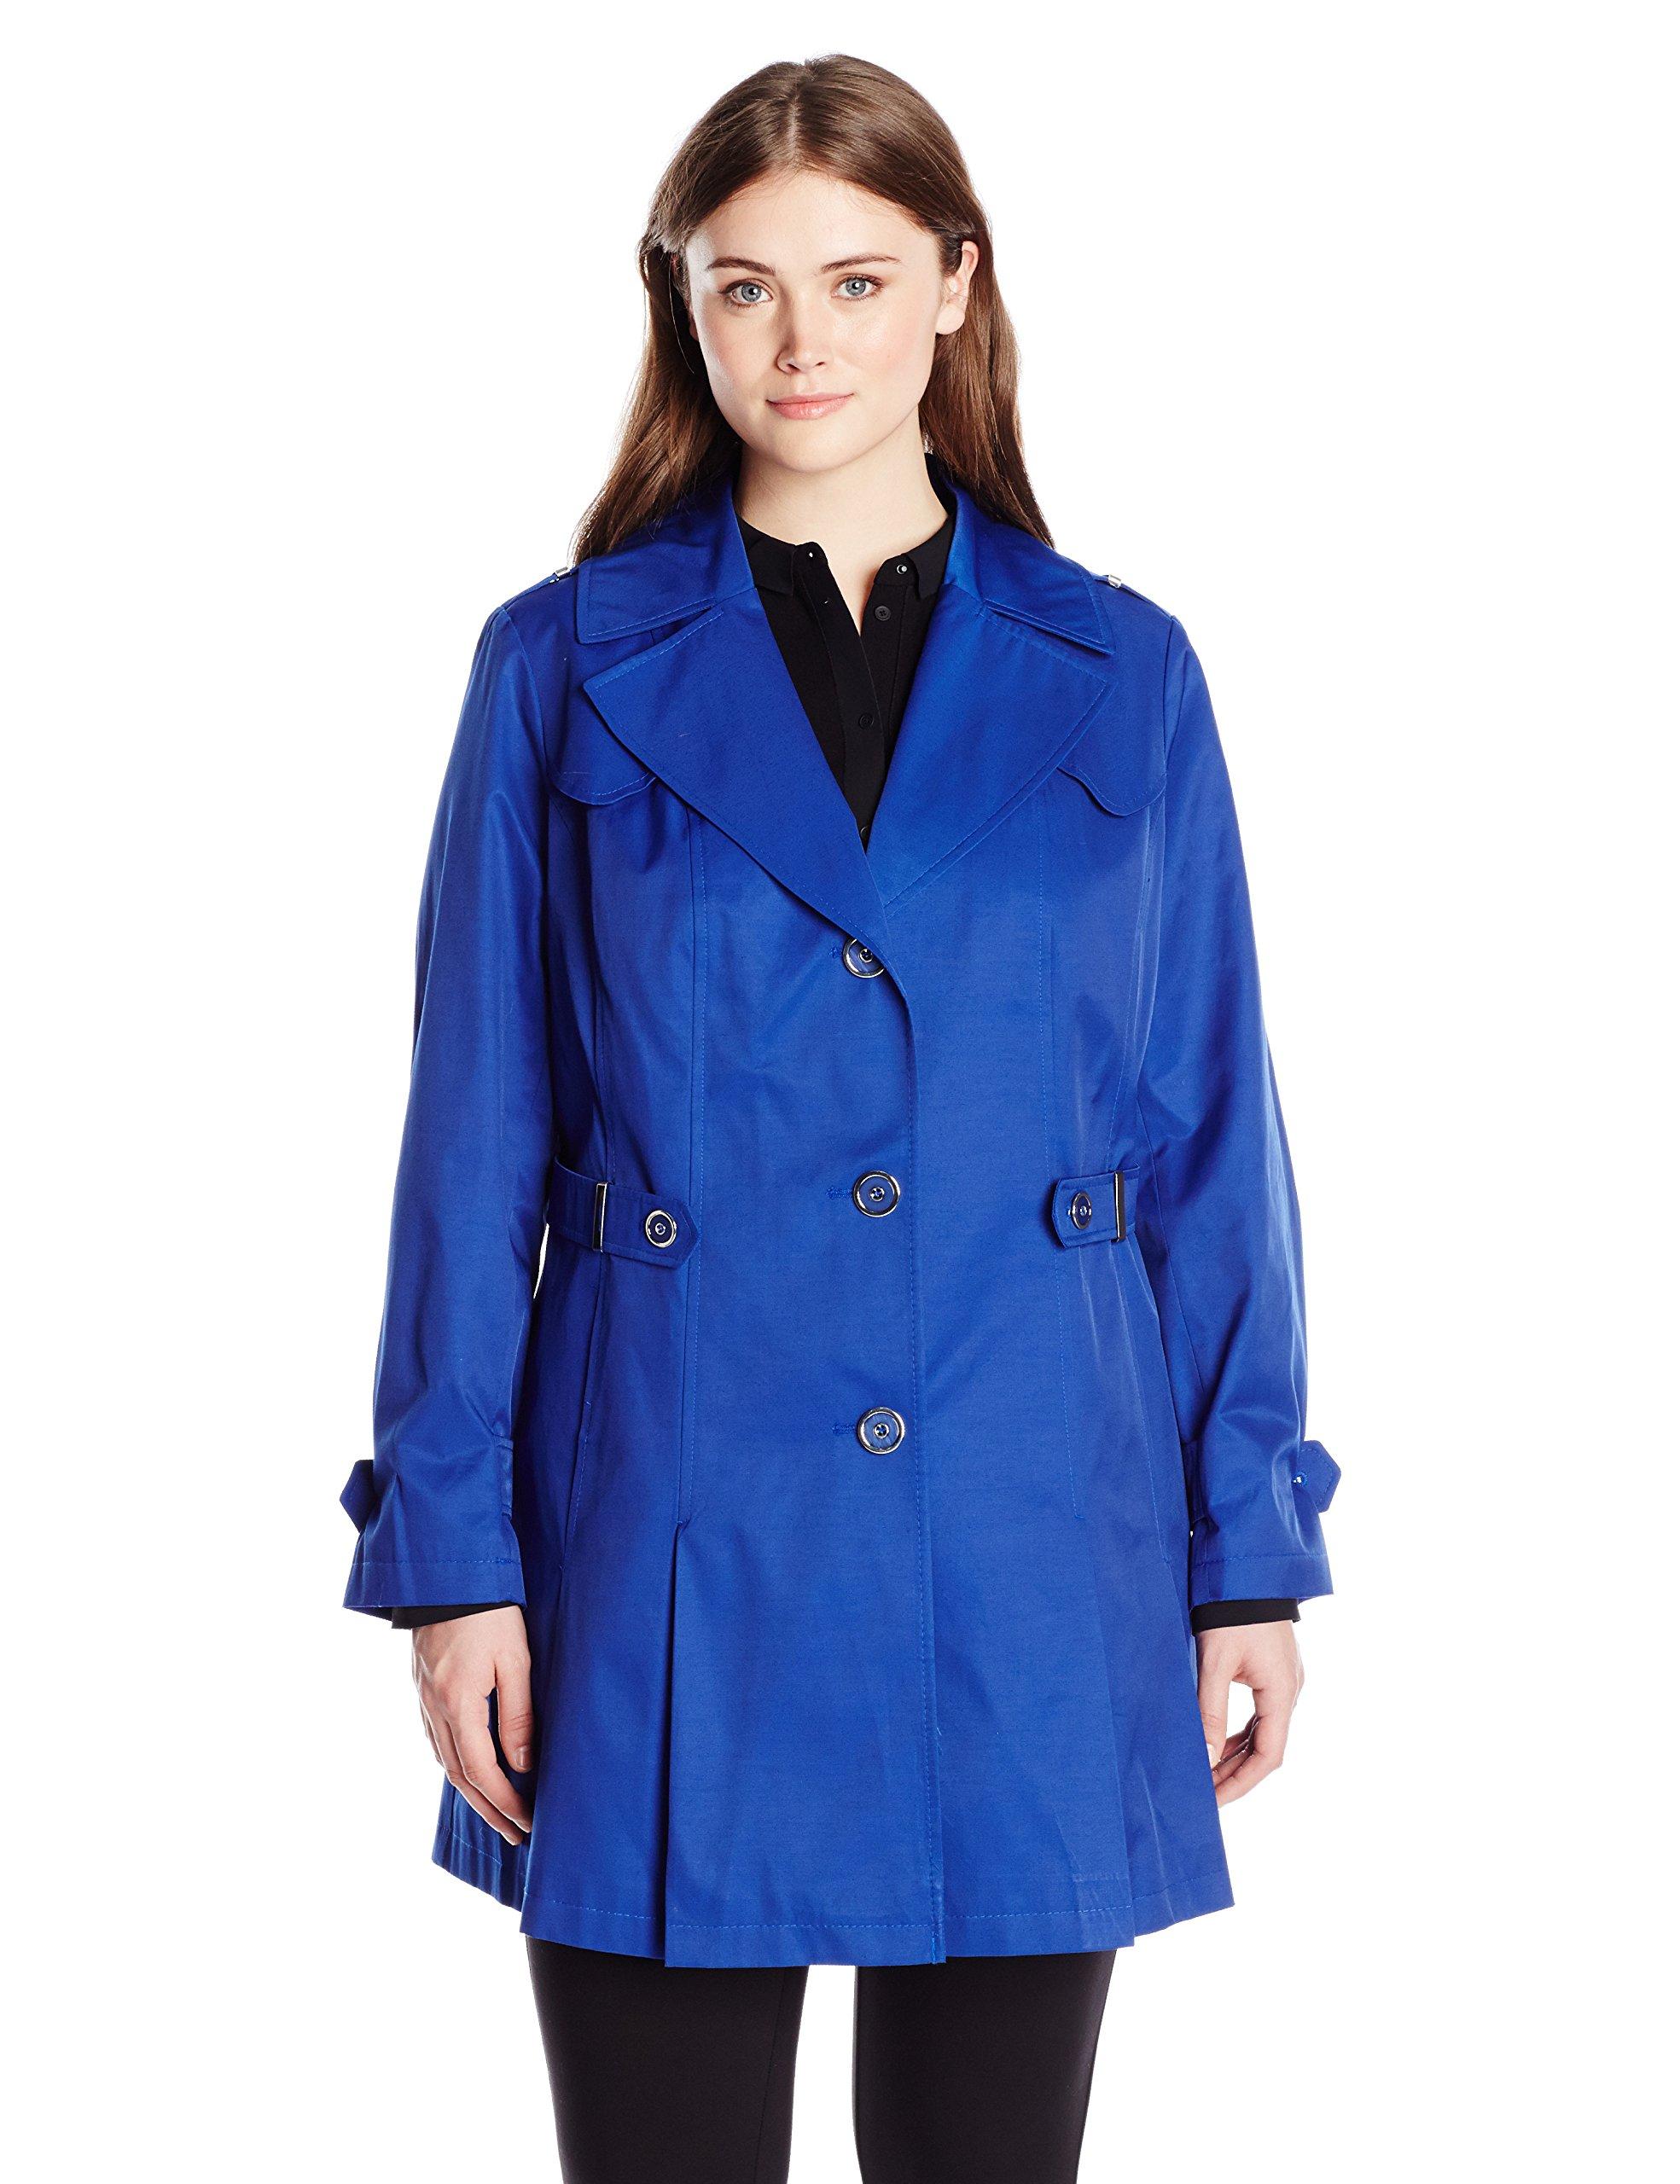 Via Spiga Women's Plus-Size Single Breasted Pleated Trench Coat, Positano Blue, 1X